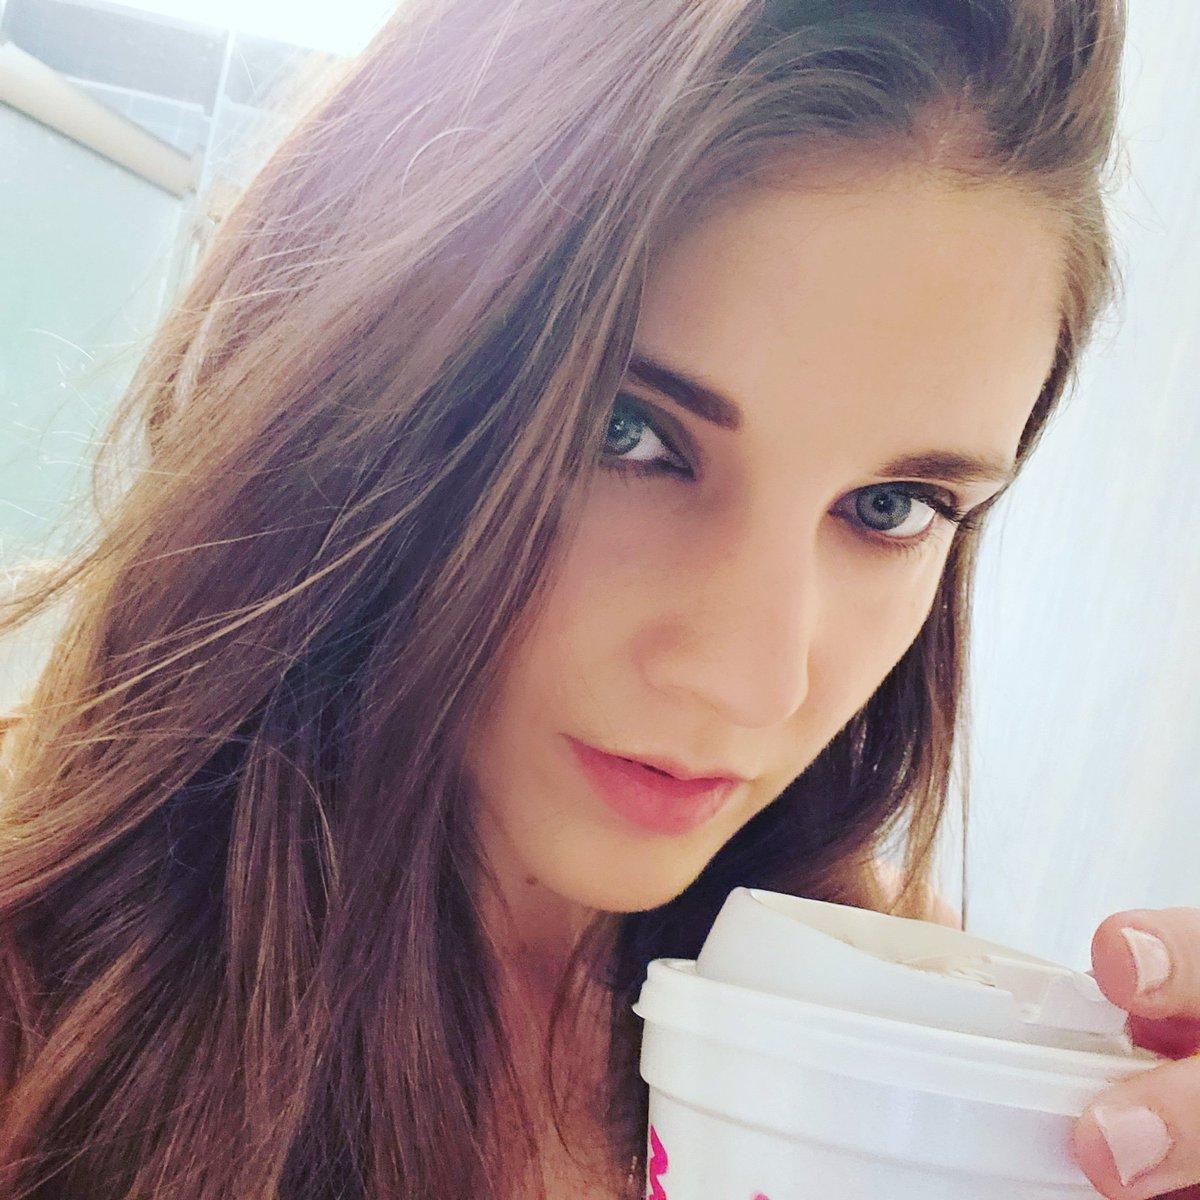 Good Morning Mamas! I hope you have a fabulous day and week, coffee cheers  Be confident. Be strong. Feel beautiful! #mtsm #happymonday #coffee #coffeecheers #momlove #selfie #instamom #igmotherhood #monday #mondaymood #morning #goodmorning #blueeyes #wlyg #momselfie #mondayspic.twitter.com/lgA0191xGp